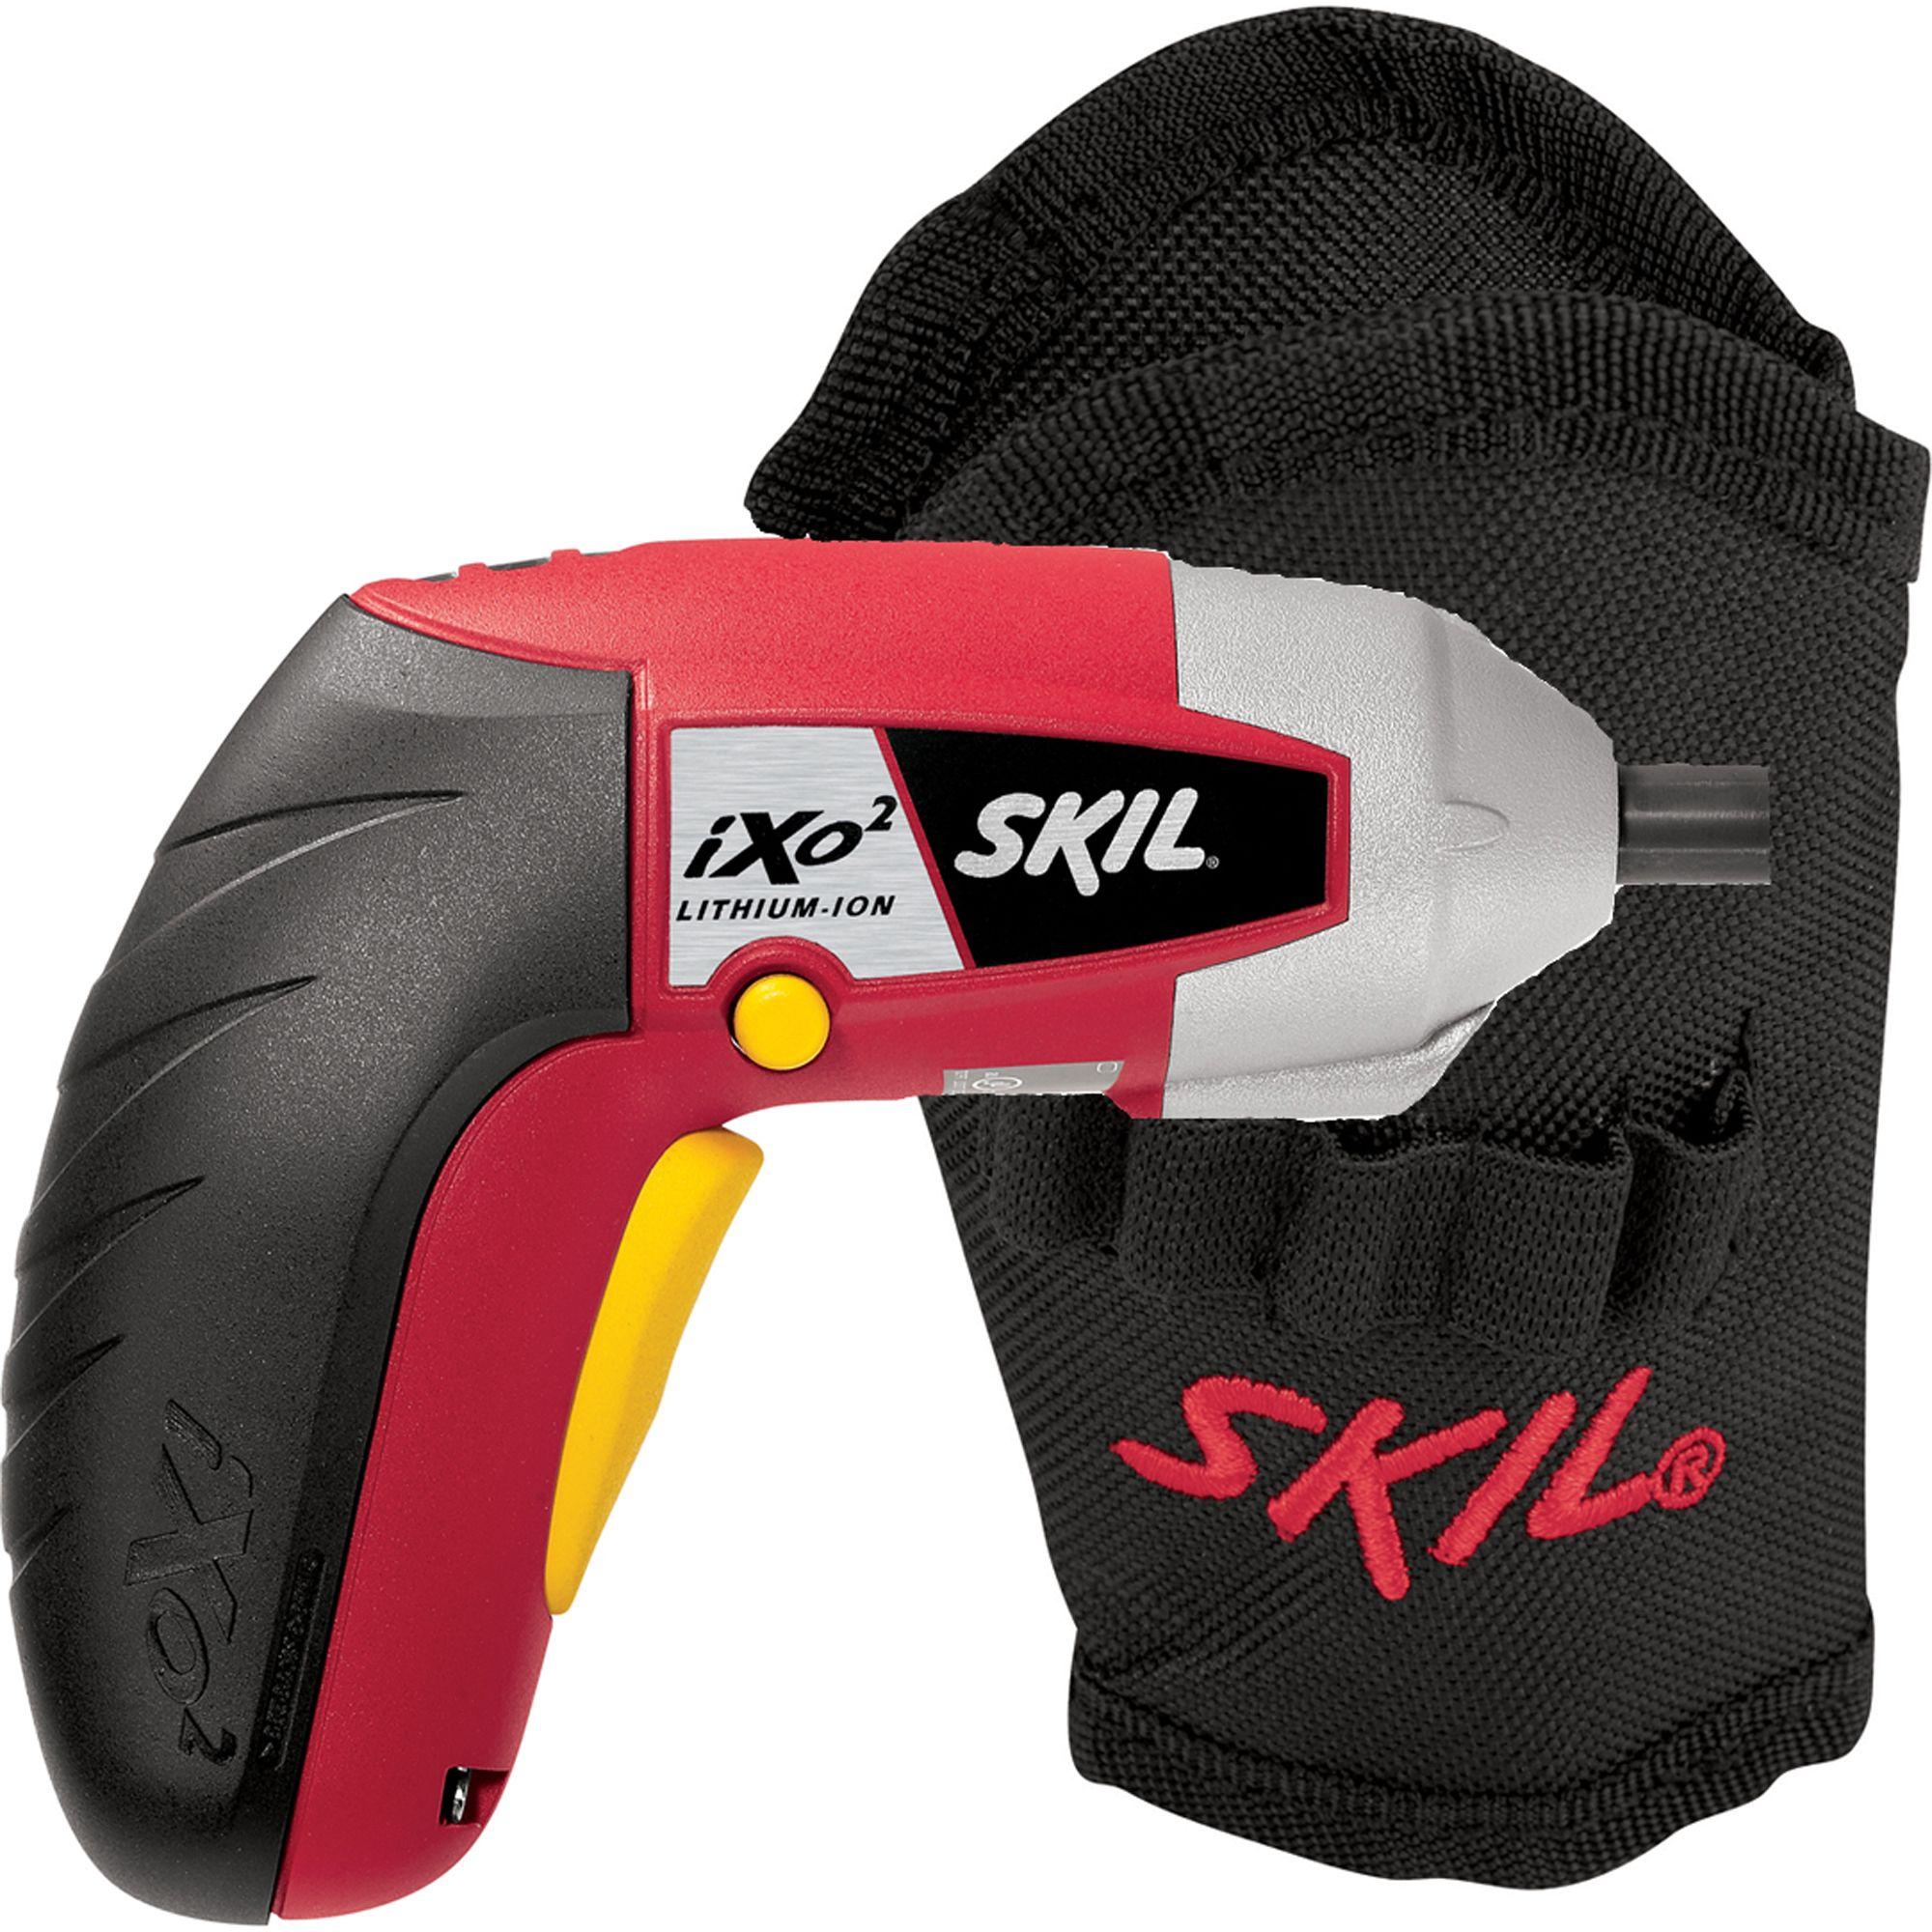 Skil iXO2 Palm-Size Screwdriver 3.6 volt